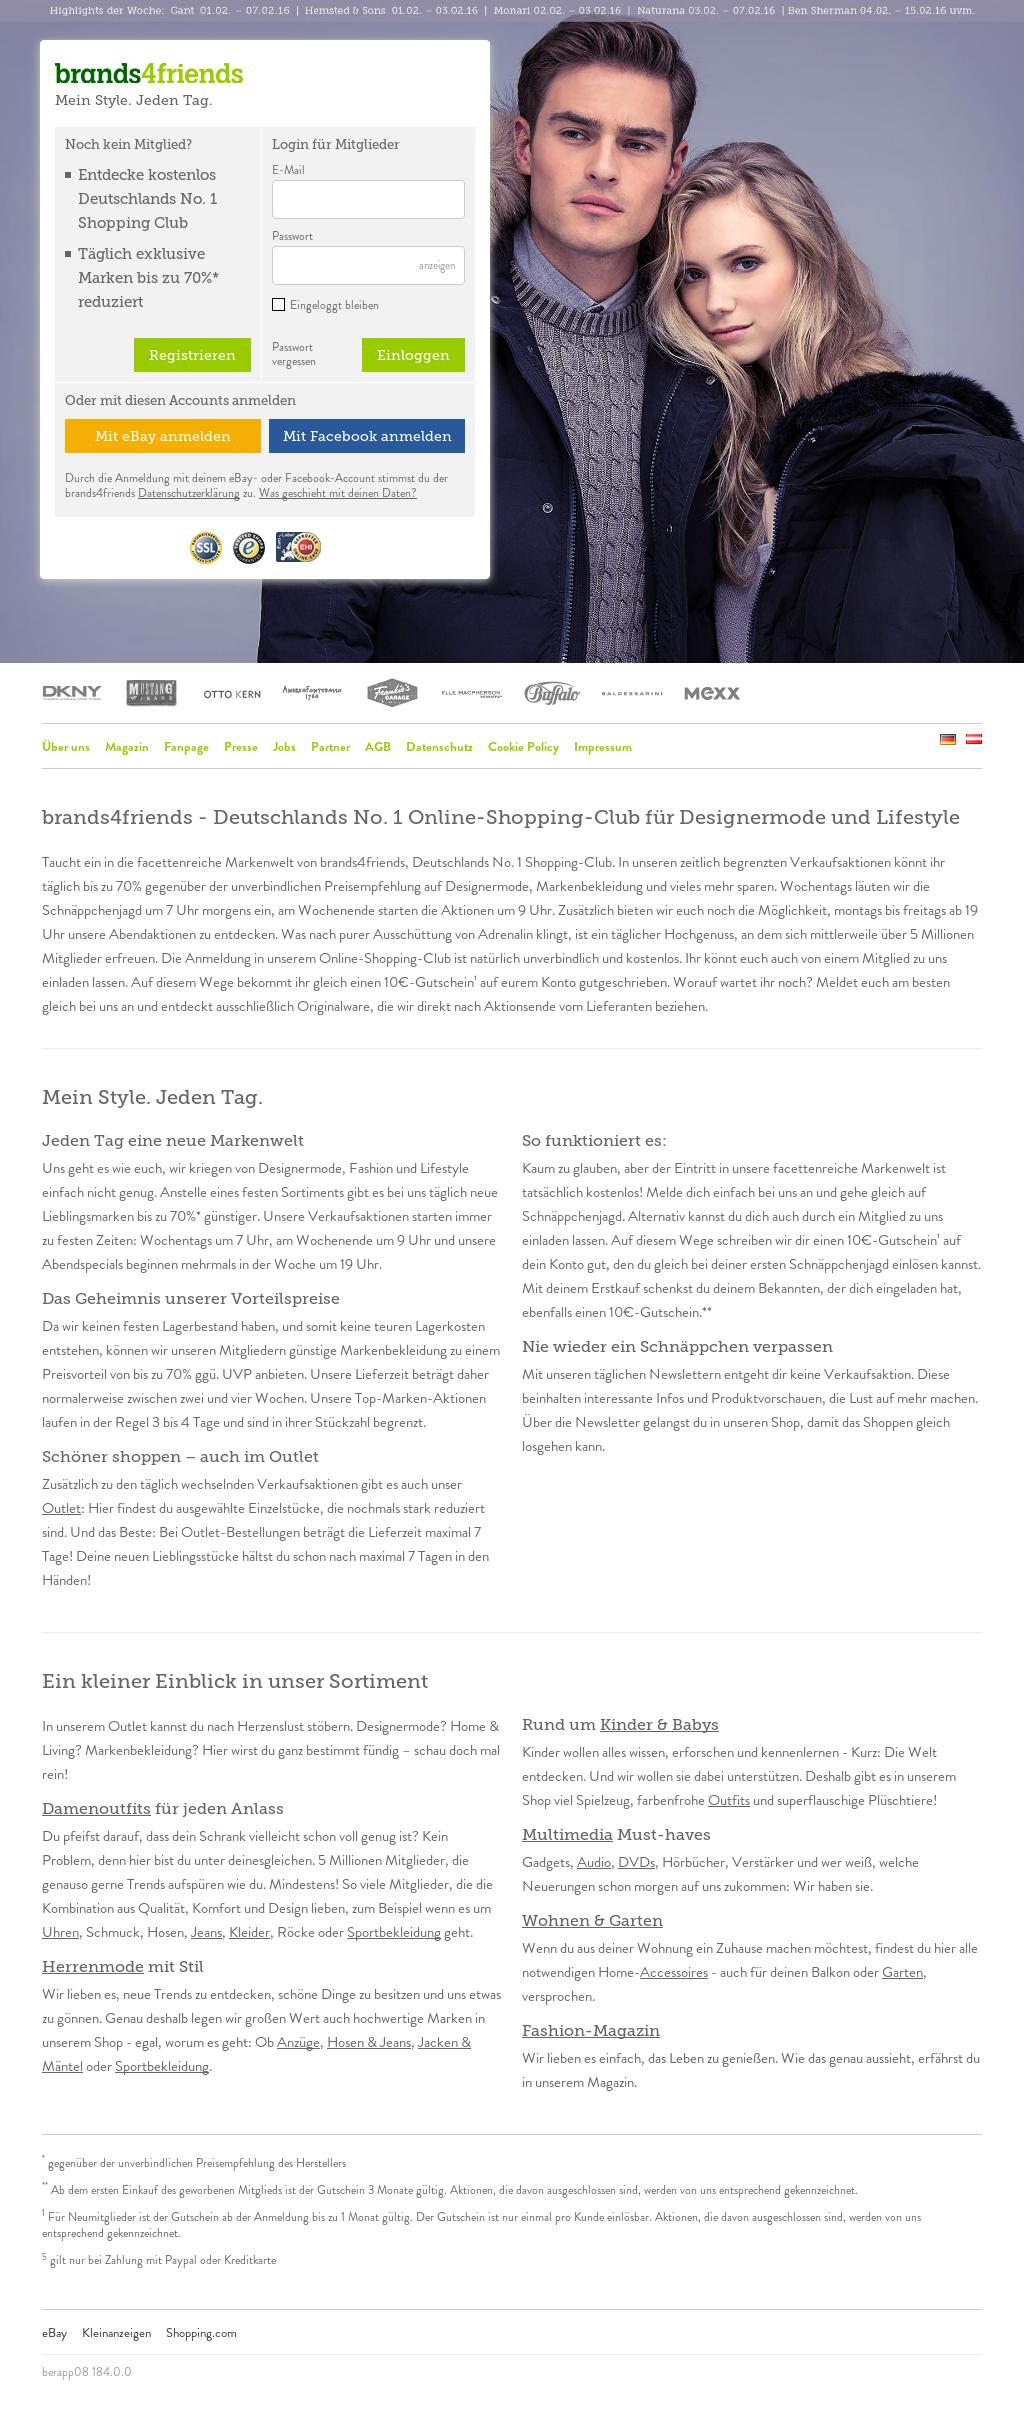 Terrific Deinschrank De Lieferzeit Ideas Of Petitors, Revenue And Employees - Pany Profile